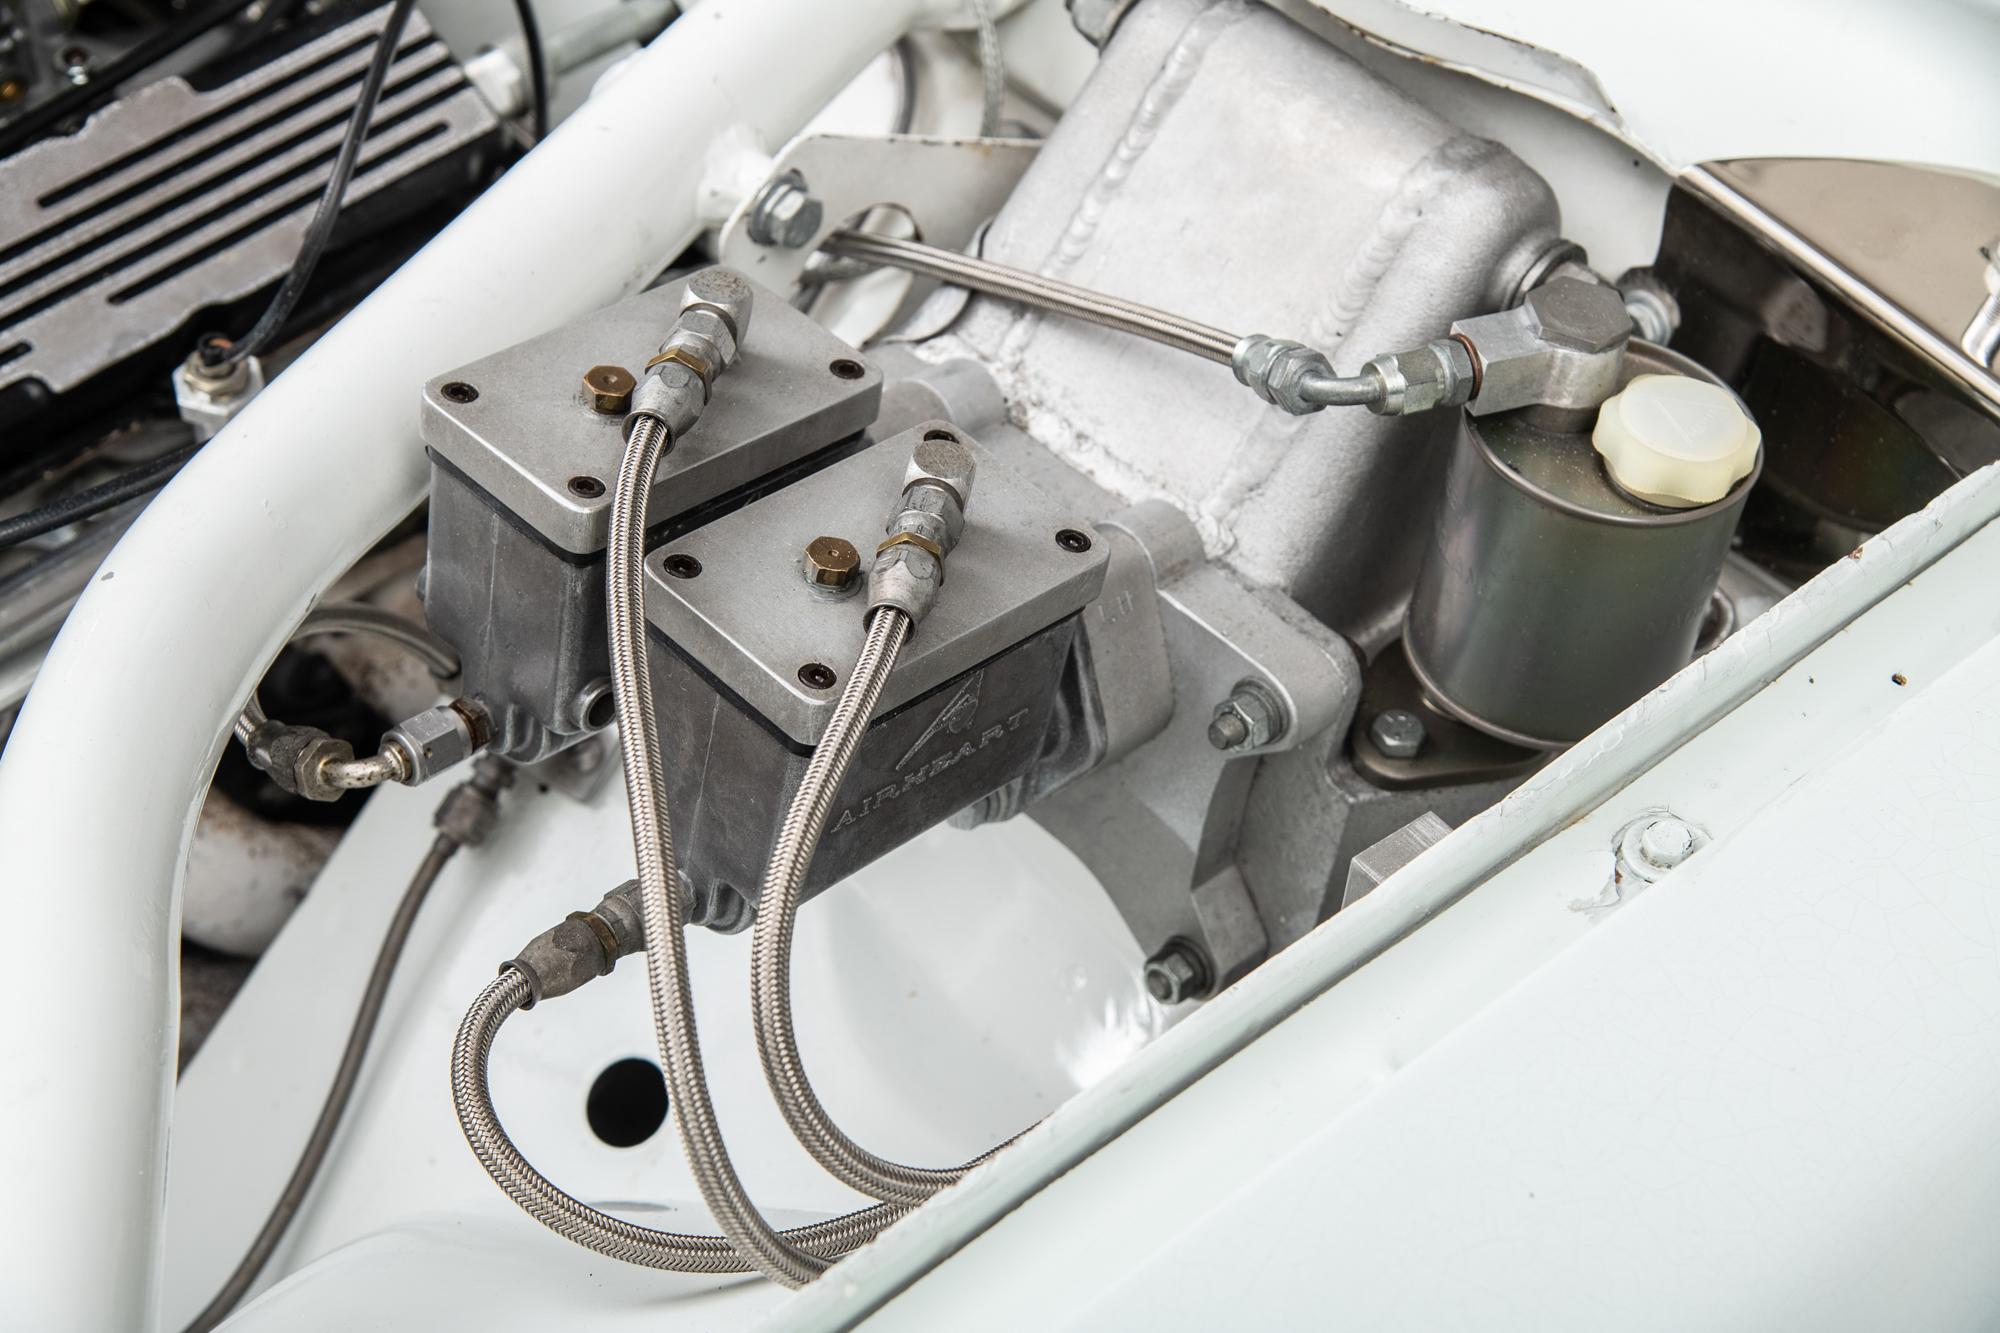 1978 Jaguar XJS Group 44 Trans-Am, WHITE, VIN 78-44